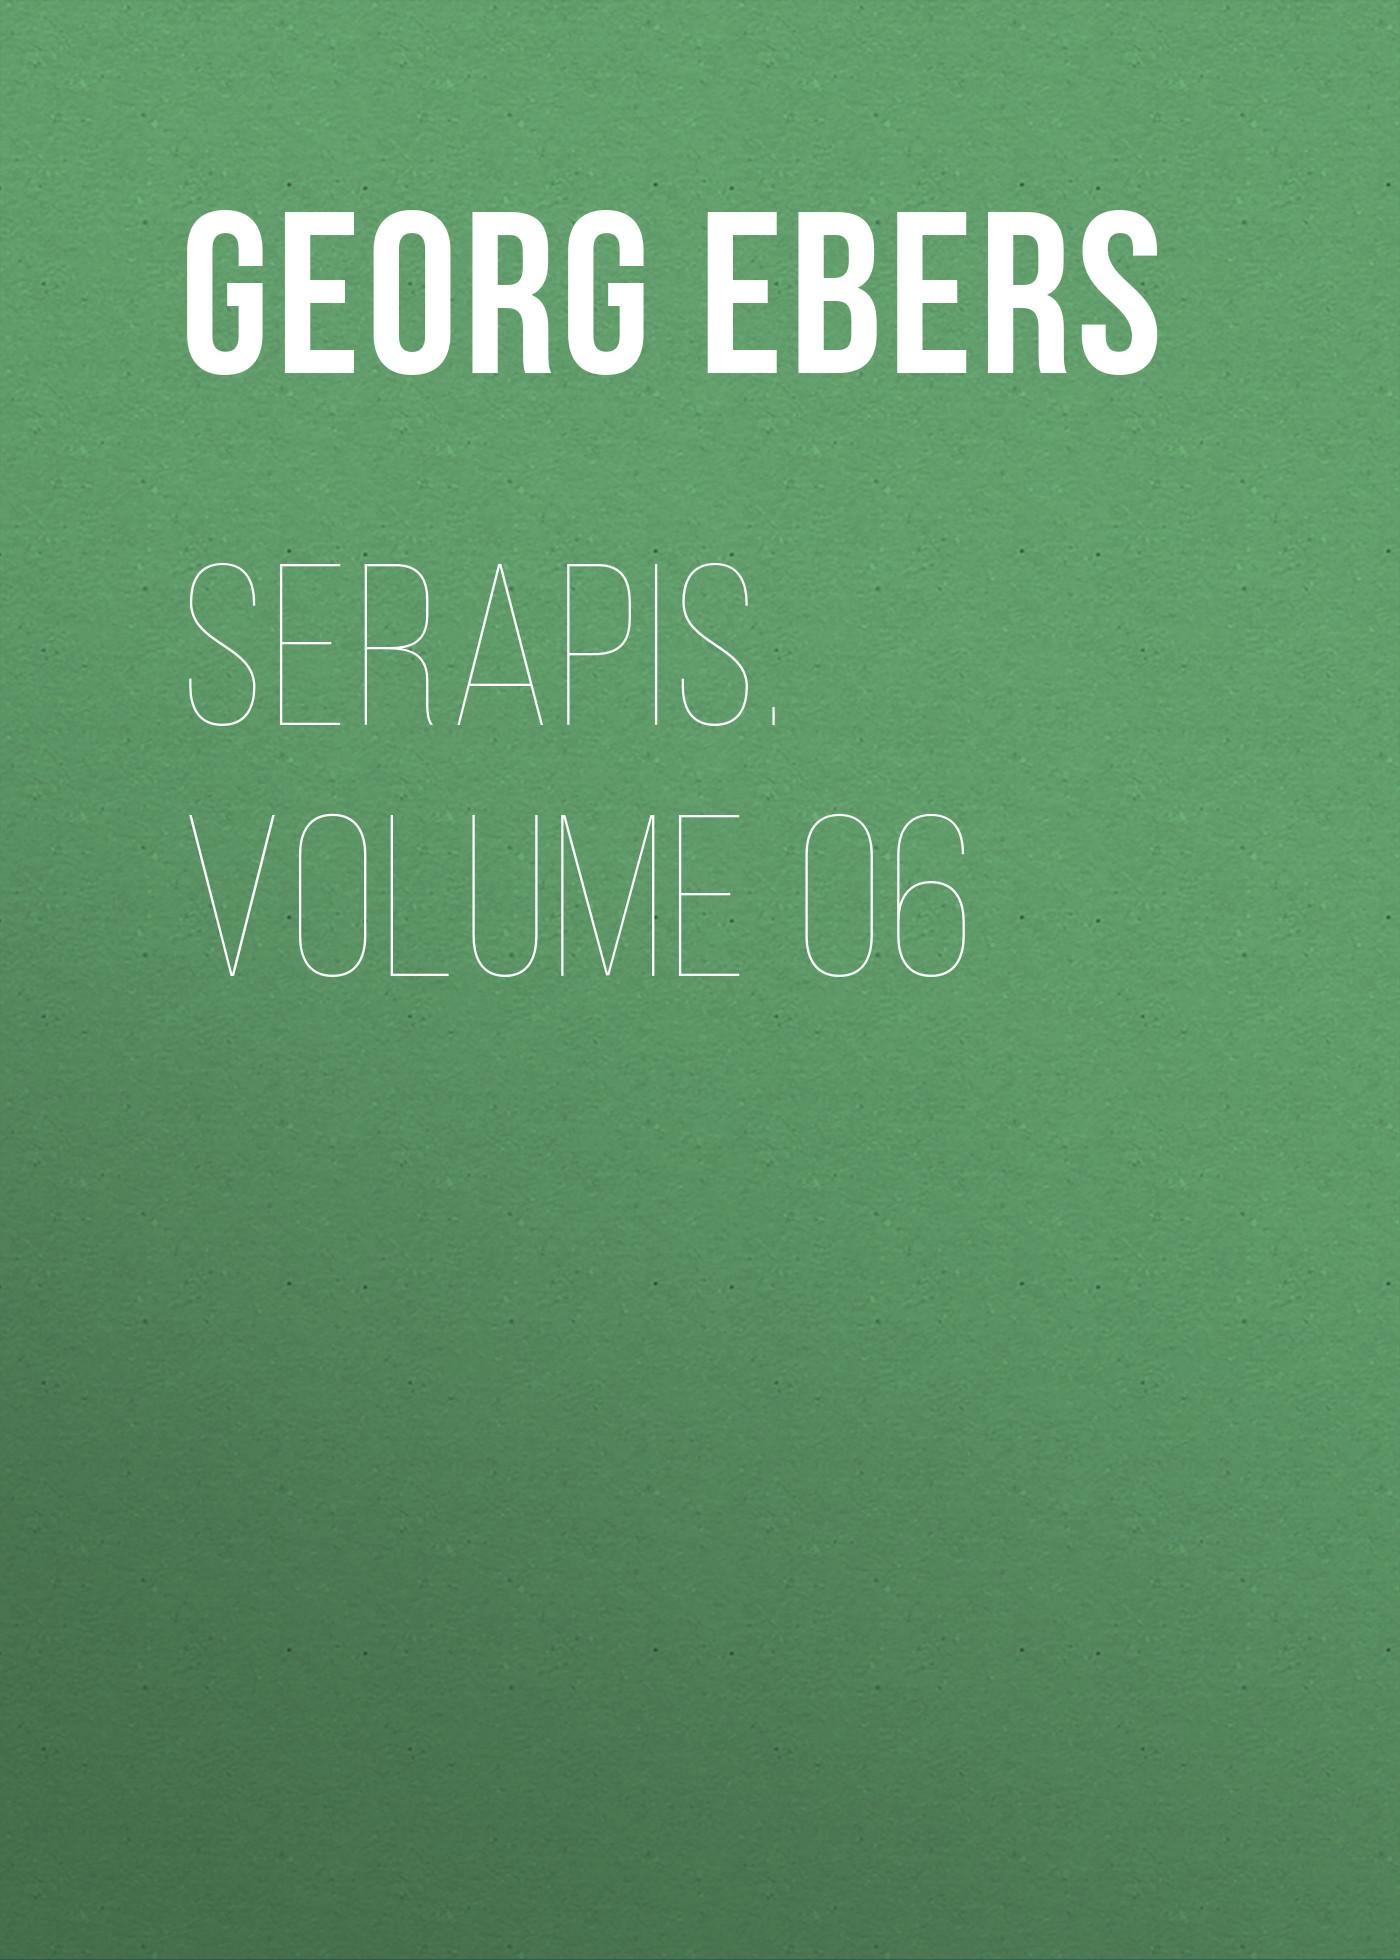 Georg Ebers Serapis. Volume 06 georg ebers homo sum volume 05